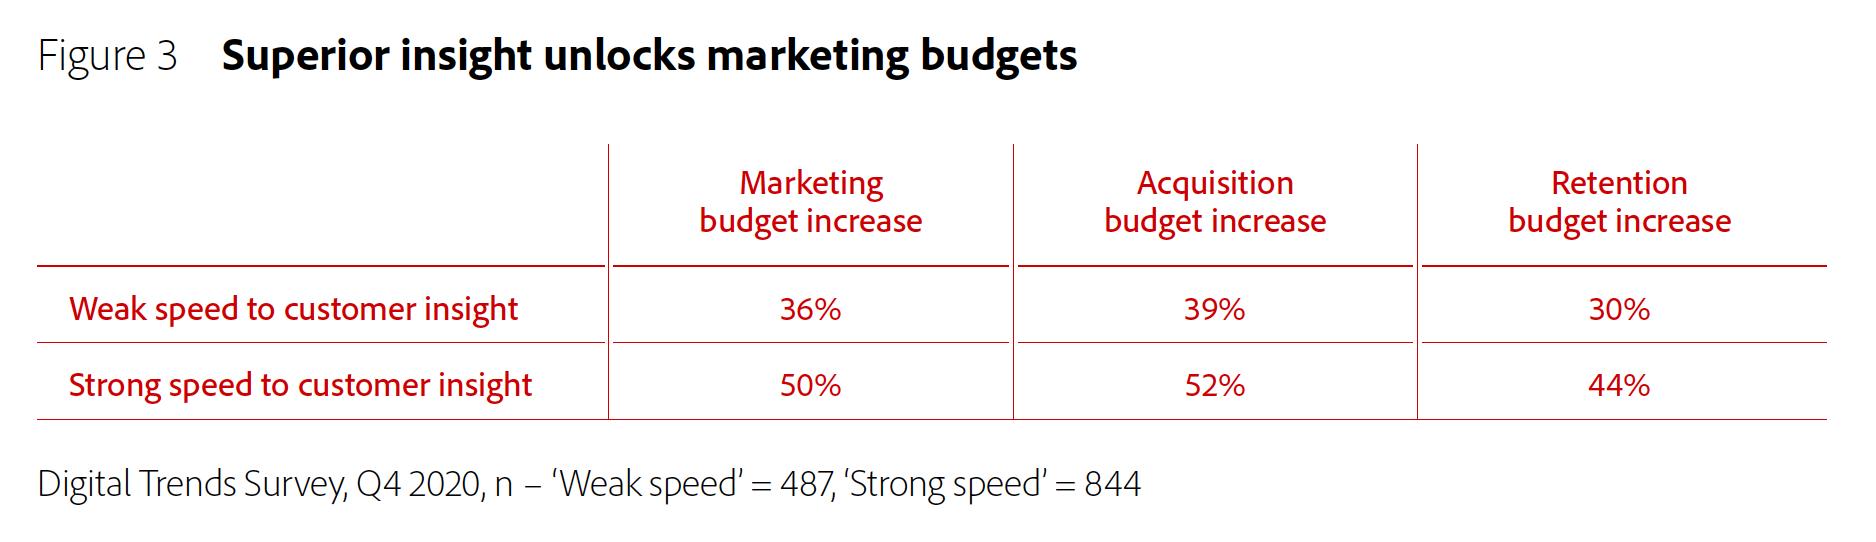 Figure 3: Superior insight unlocks marketing budgets.